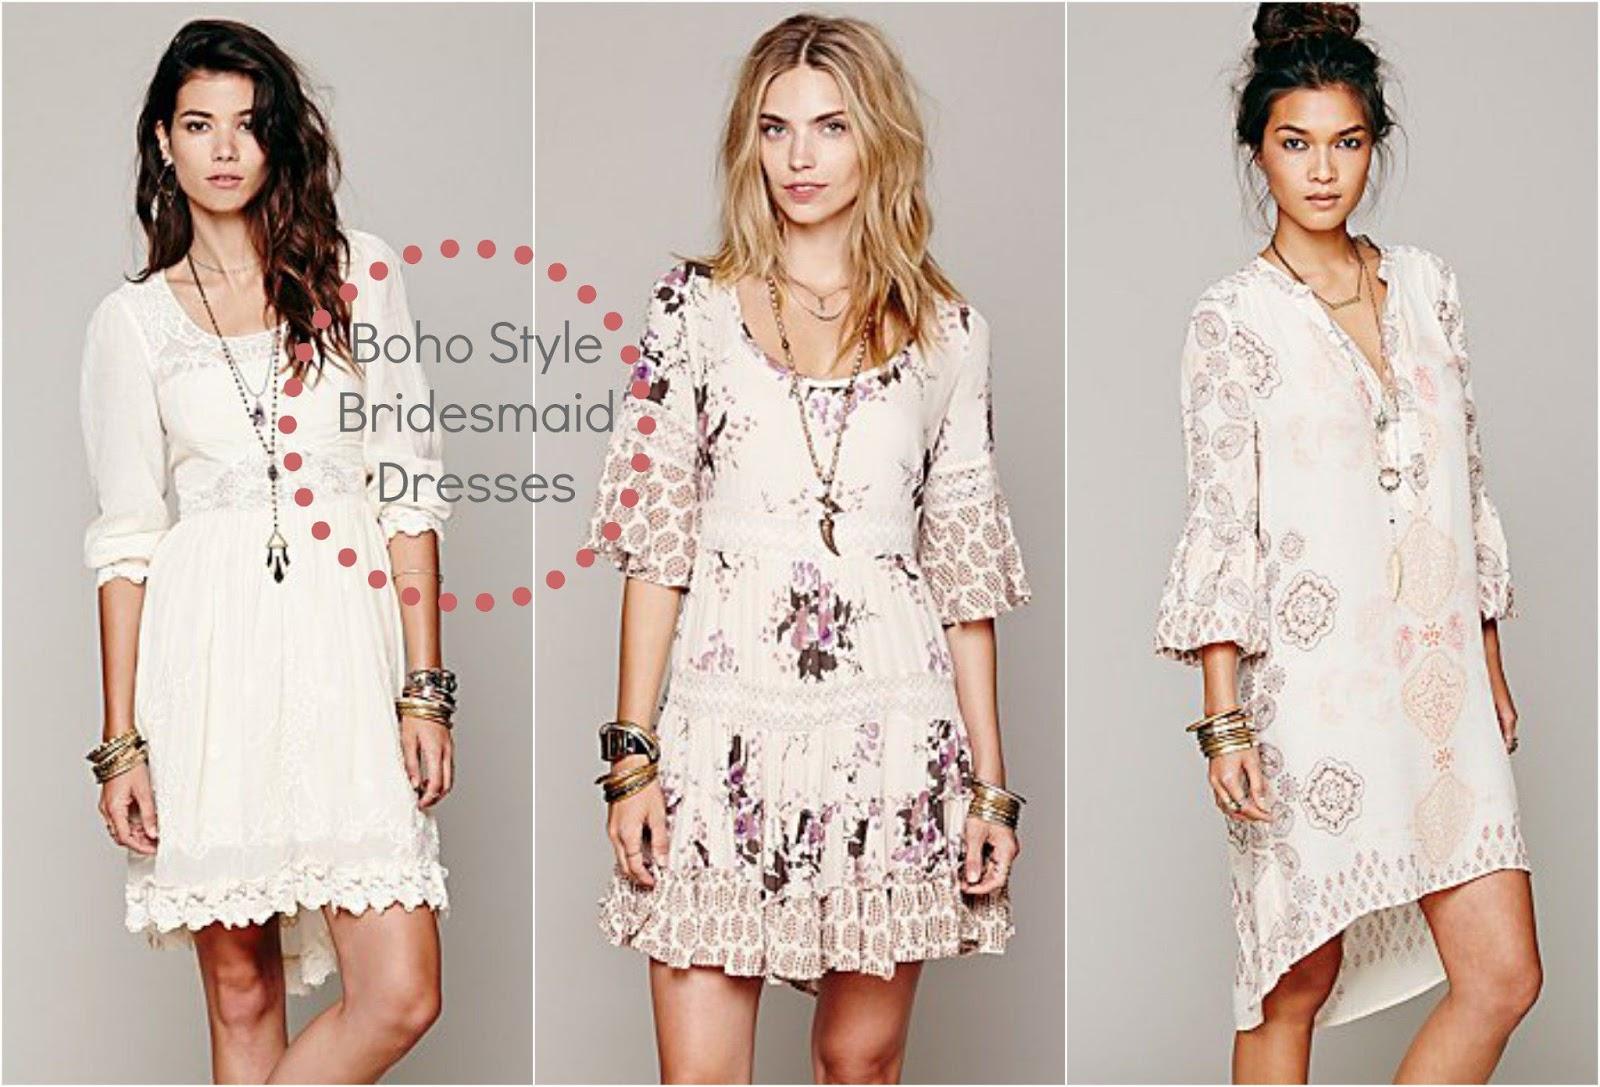 Beroemd Bohemian Style (Boho Chic Bohemian Fashion) | Fashion Style and Taste @UE12